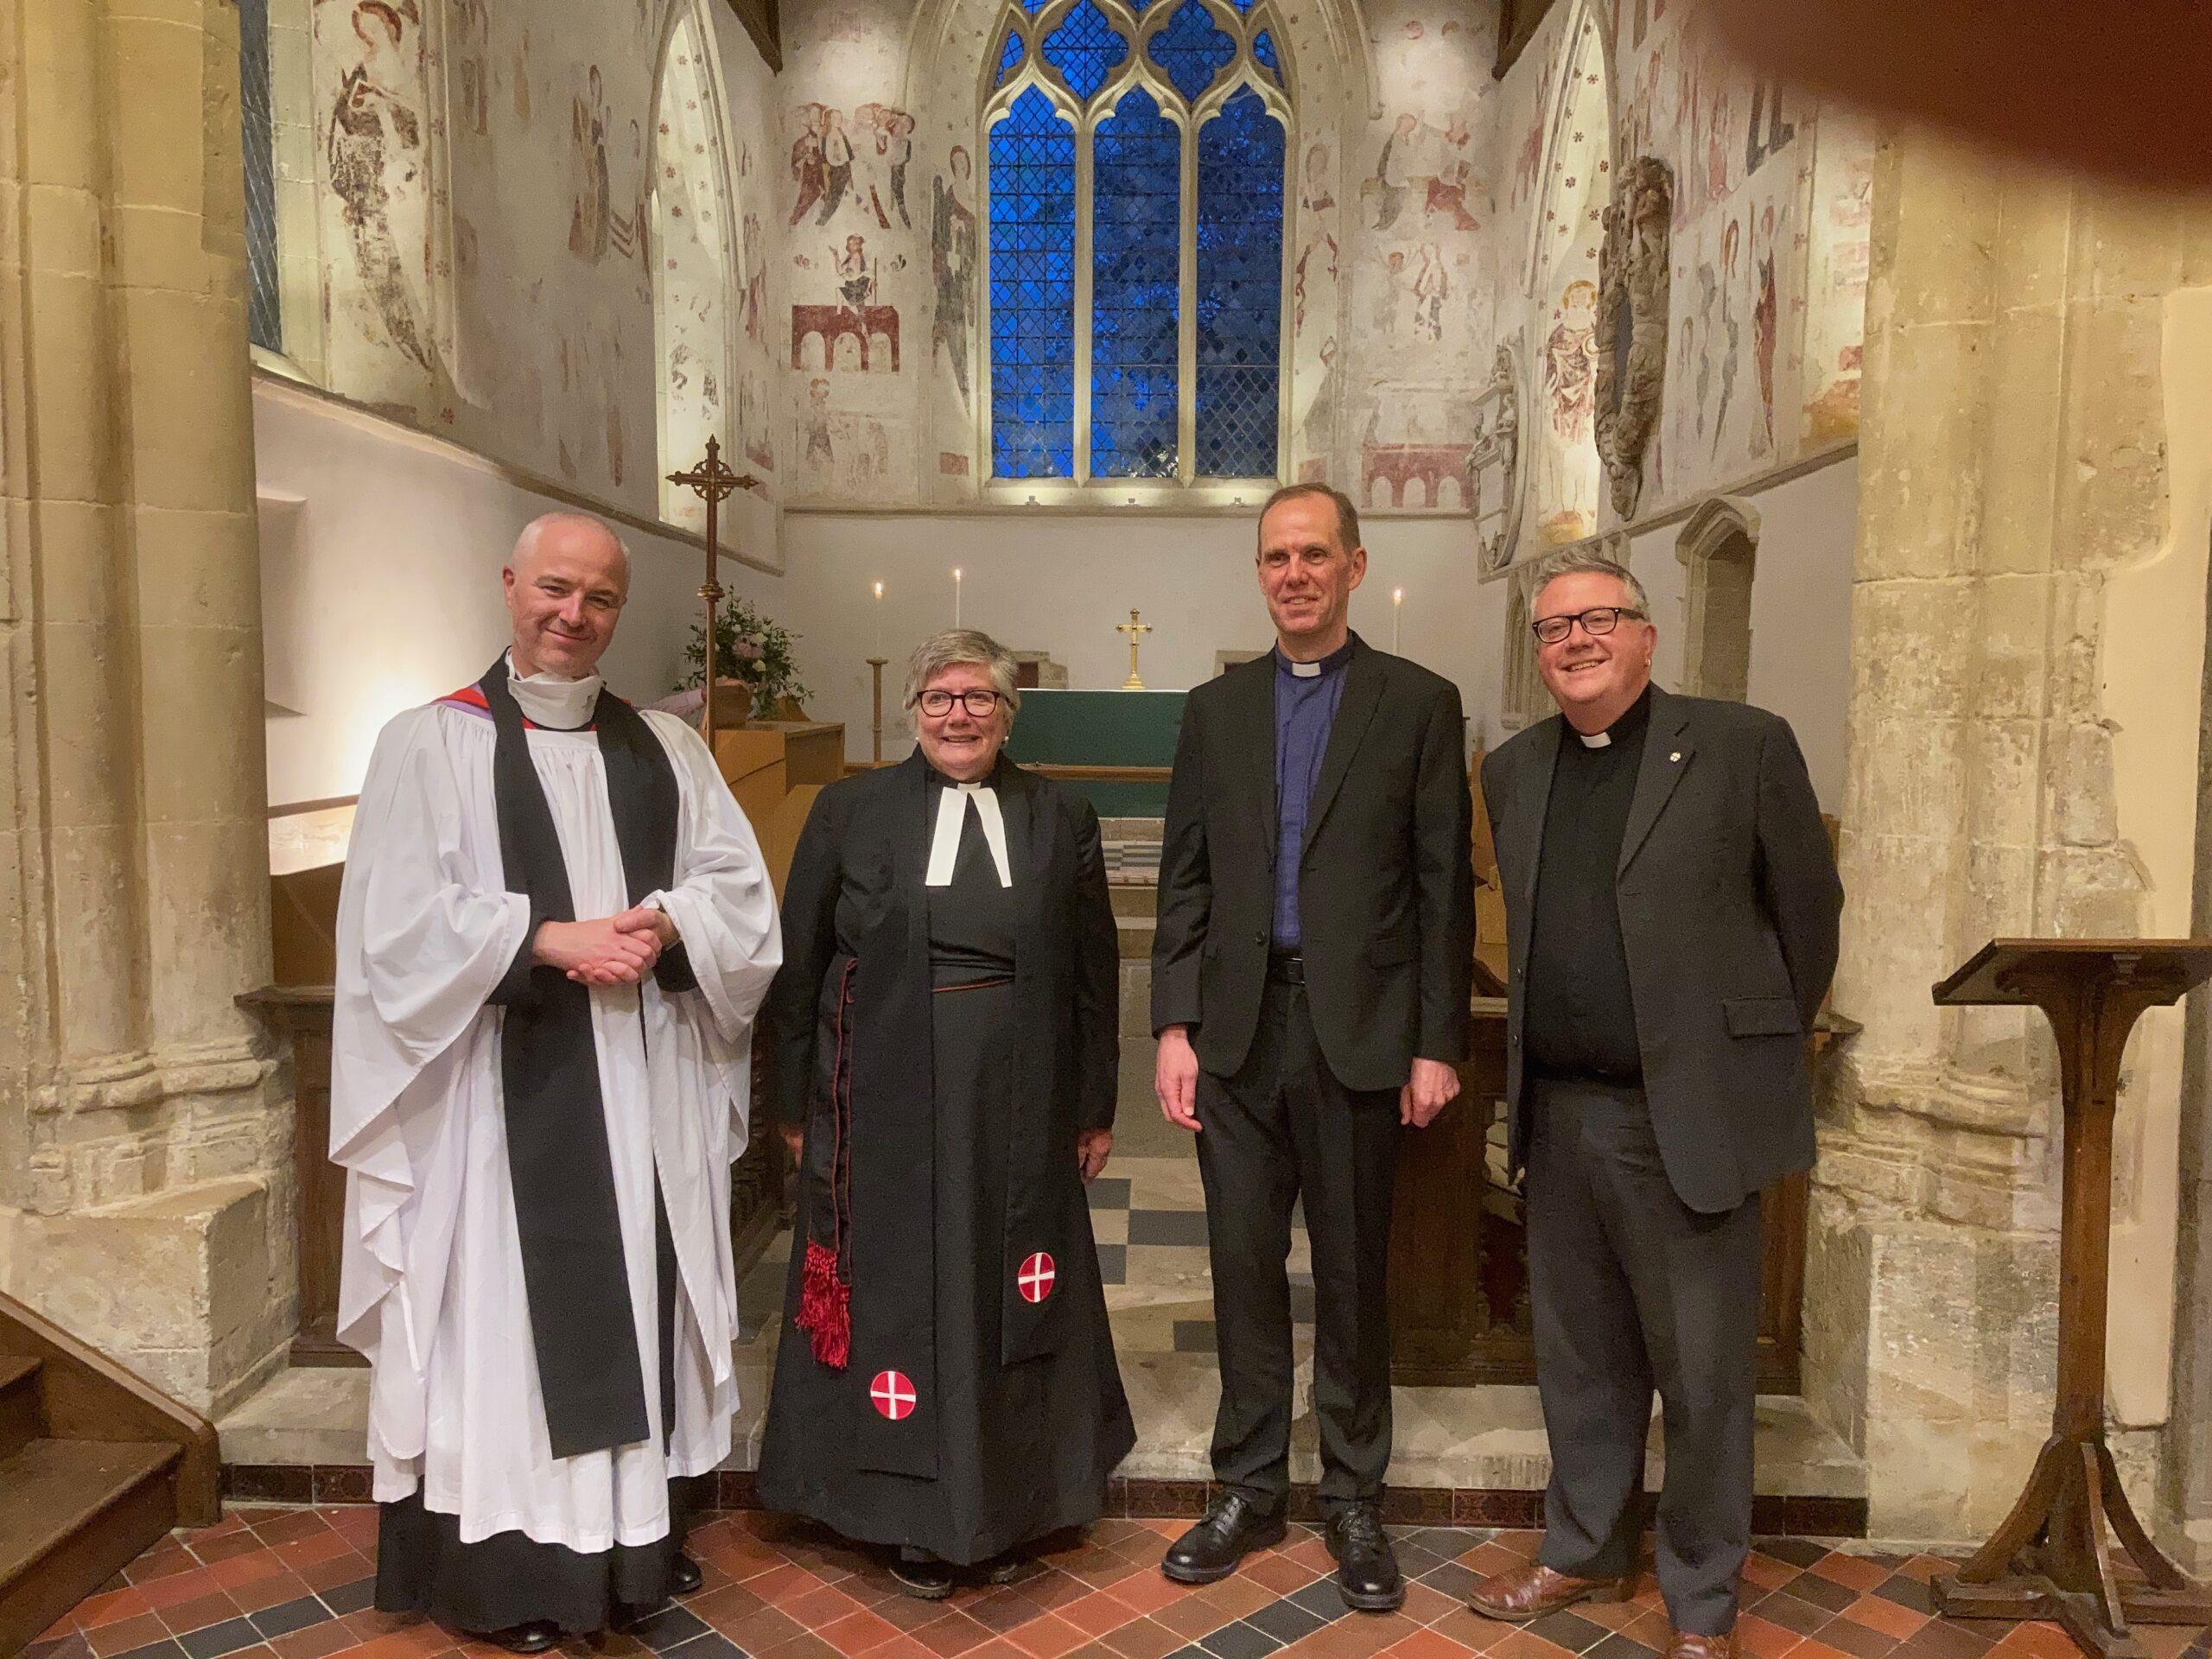 (l-r) Fr Michael, Rev'd Helen Cameron, Rev'd Stephen Spain, Rev'd Peter Powers